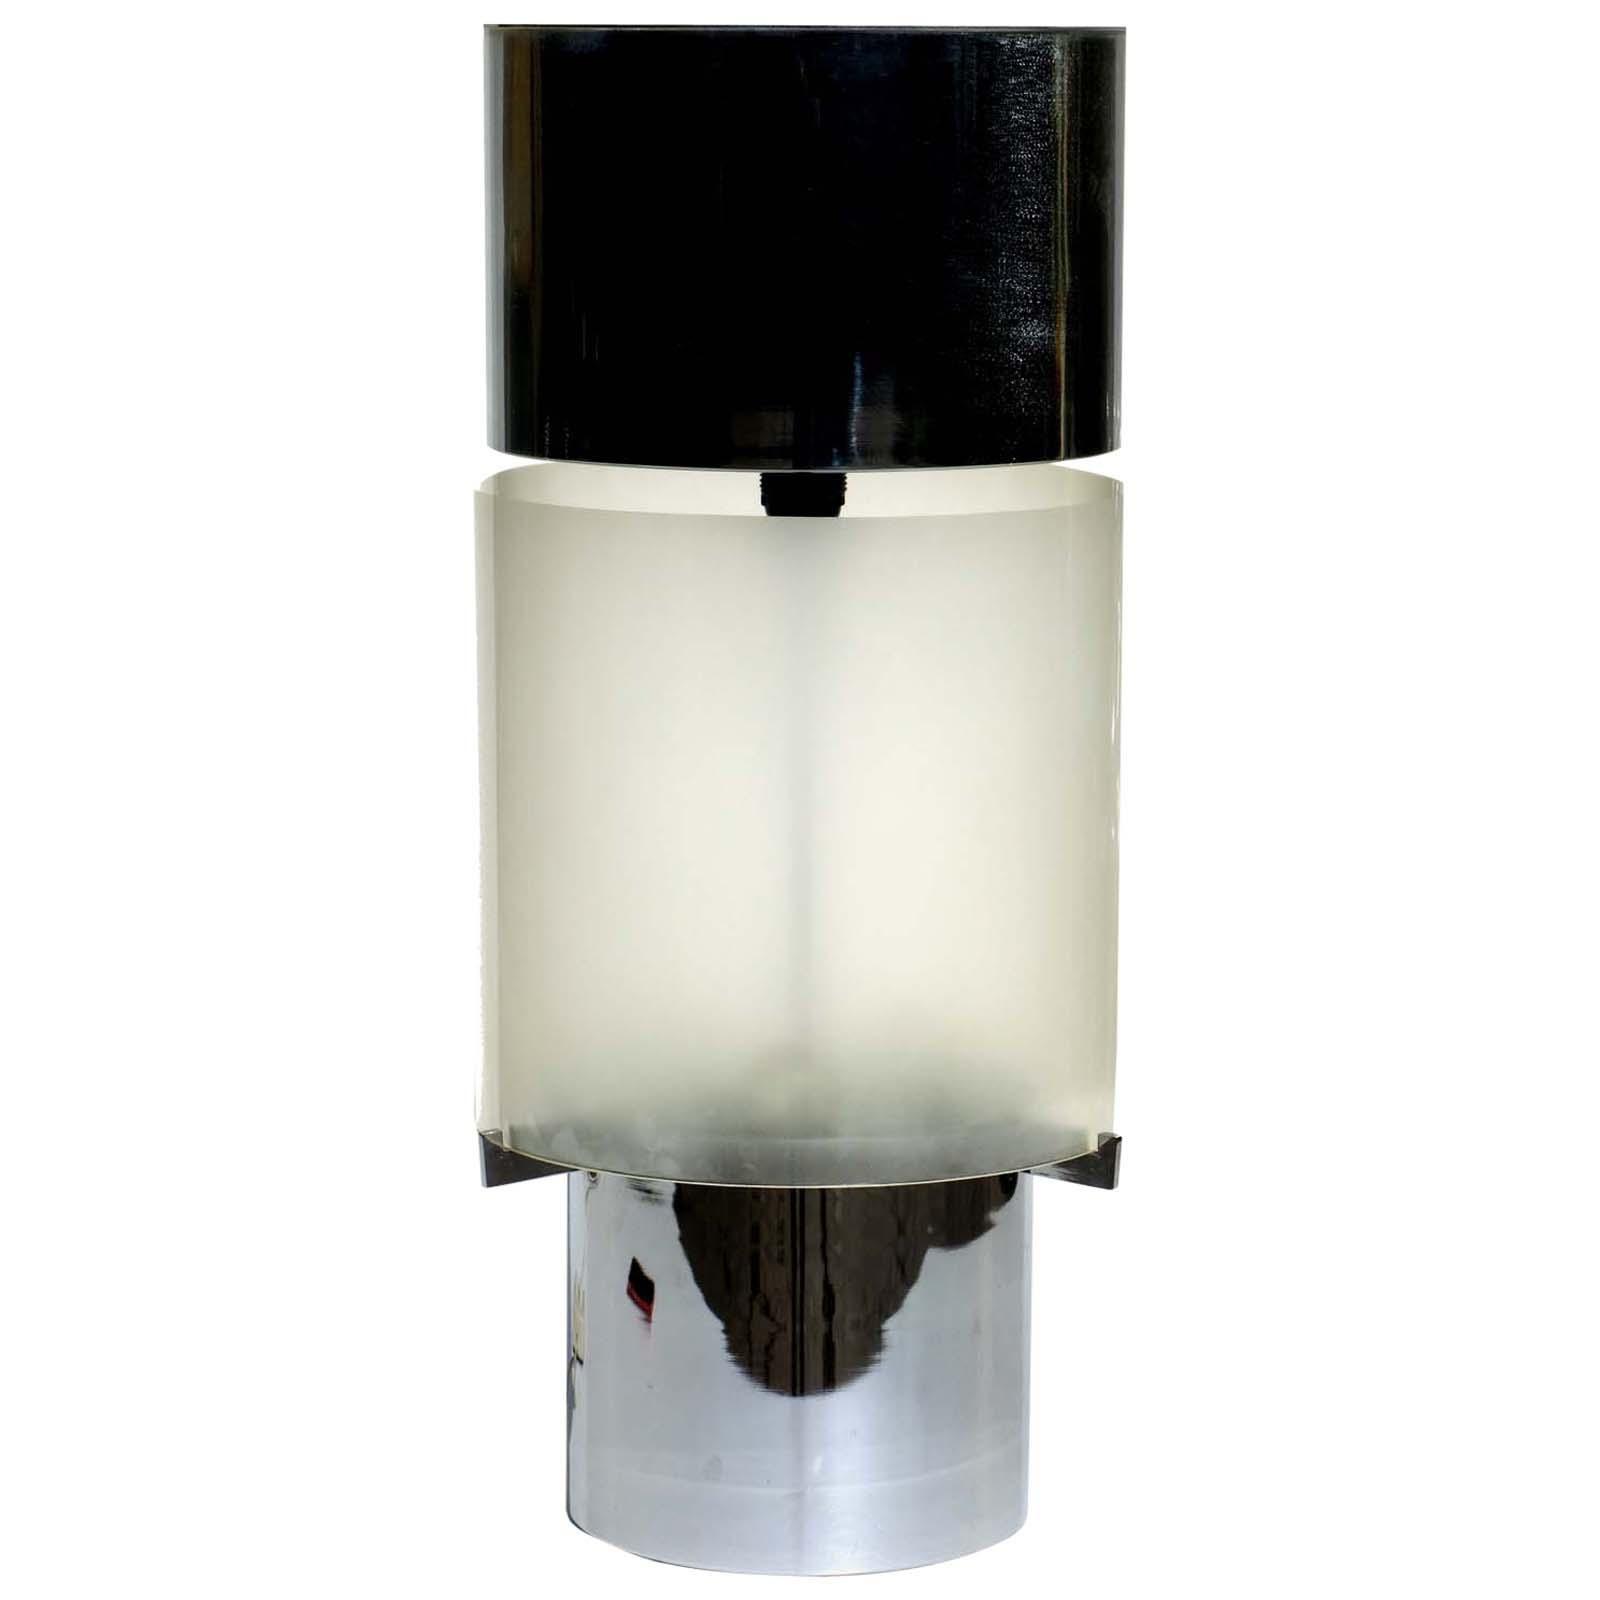 1970s Space Age Design Italian Chrome Table Lamp